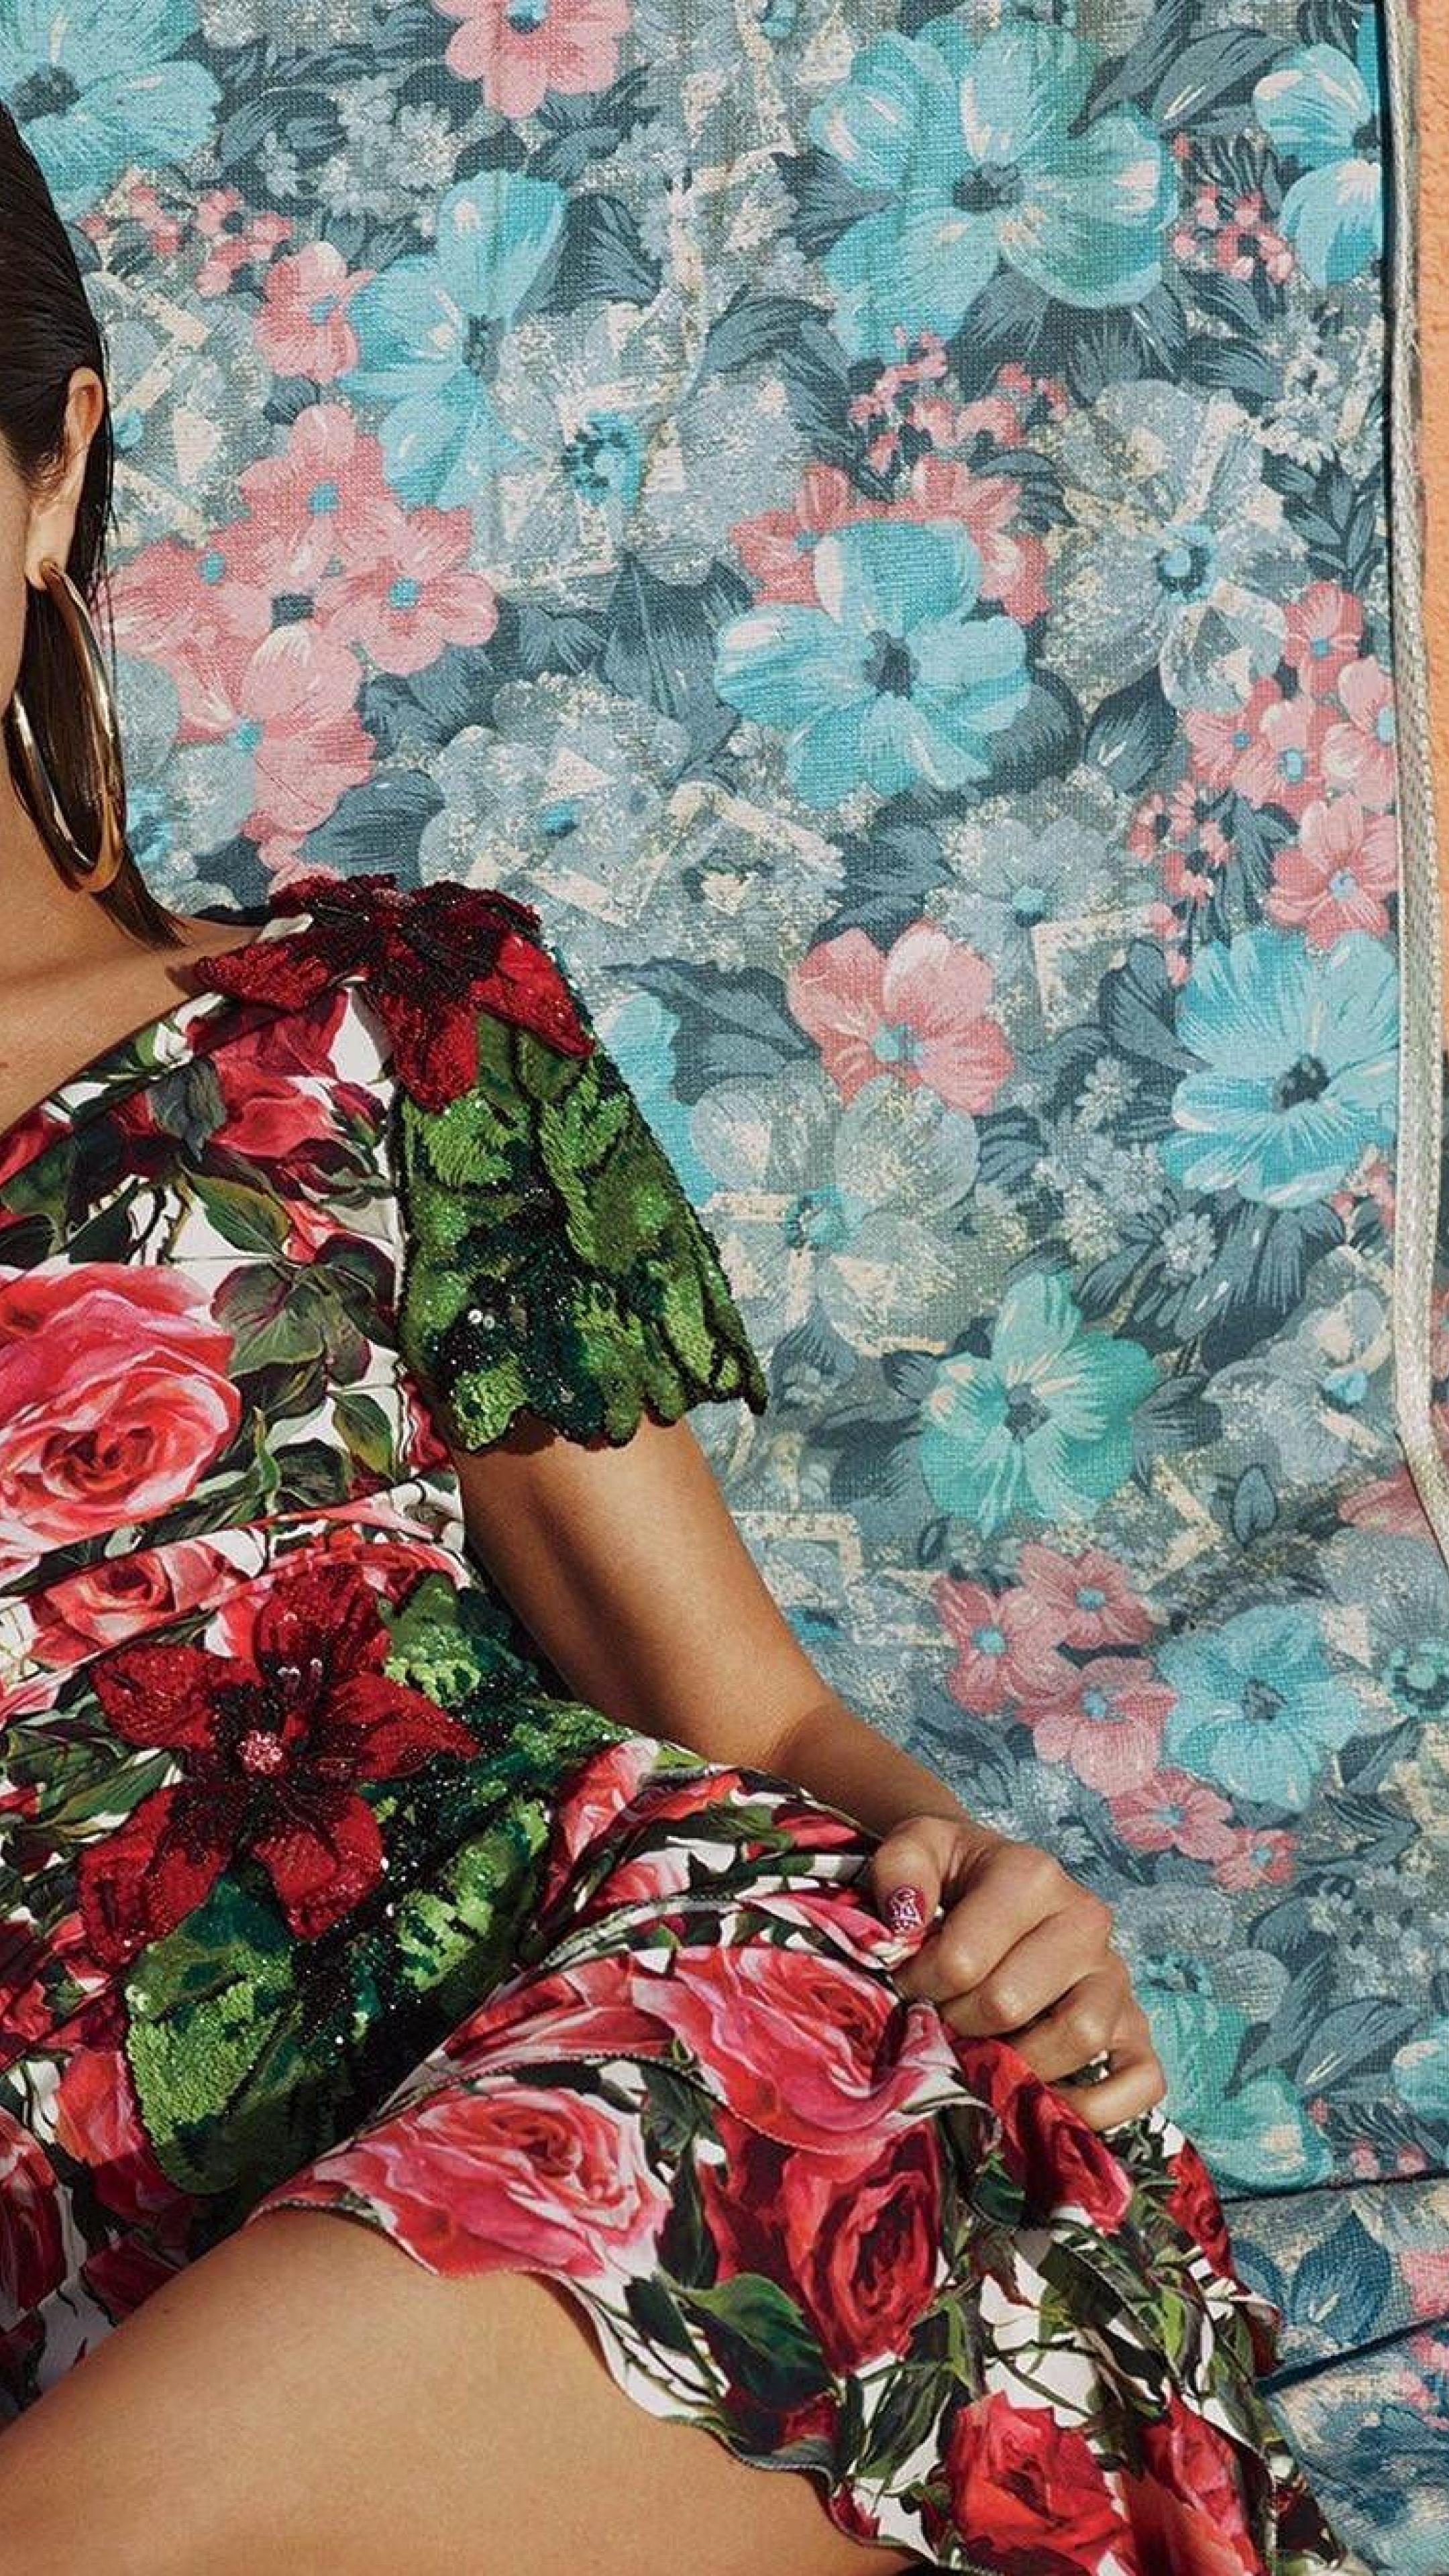 images Selena gomez photoshoot for vogue magazine us april 2019